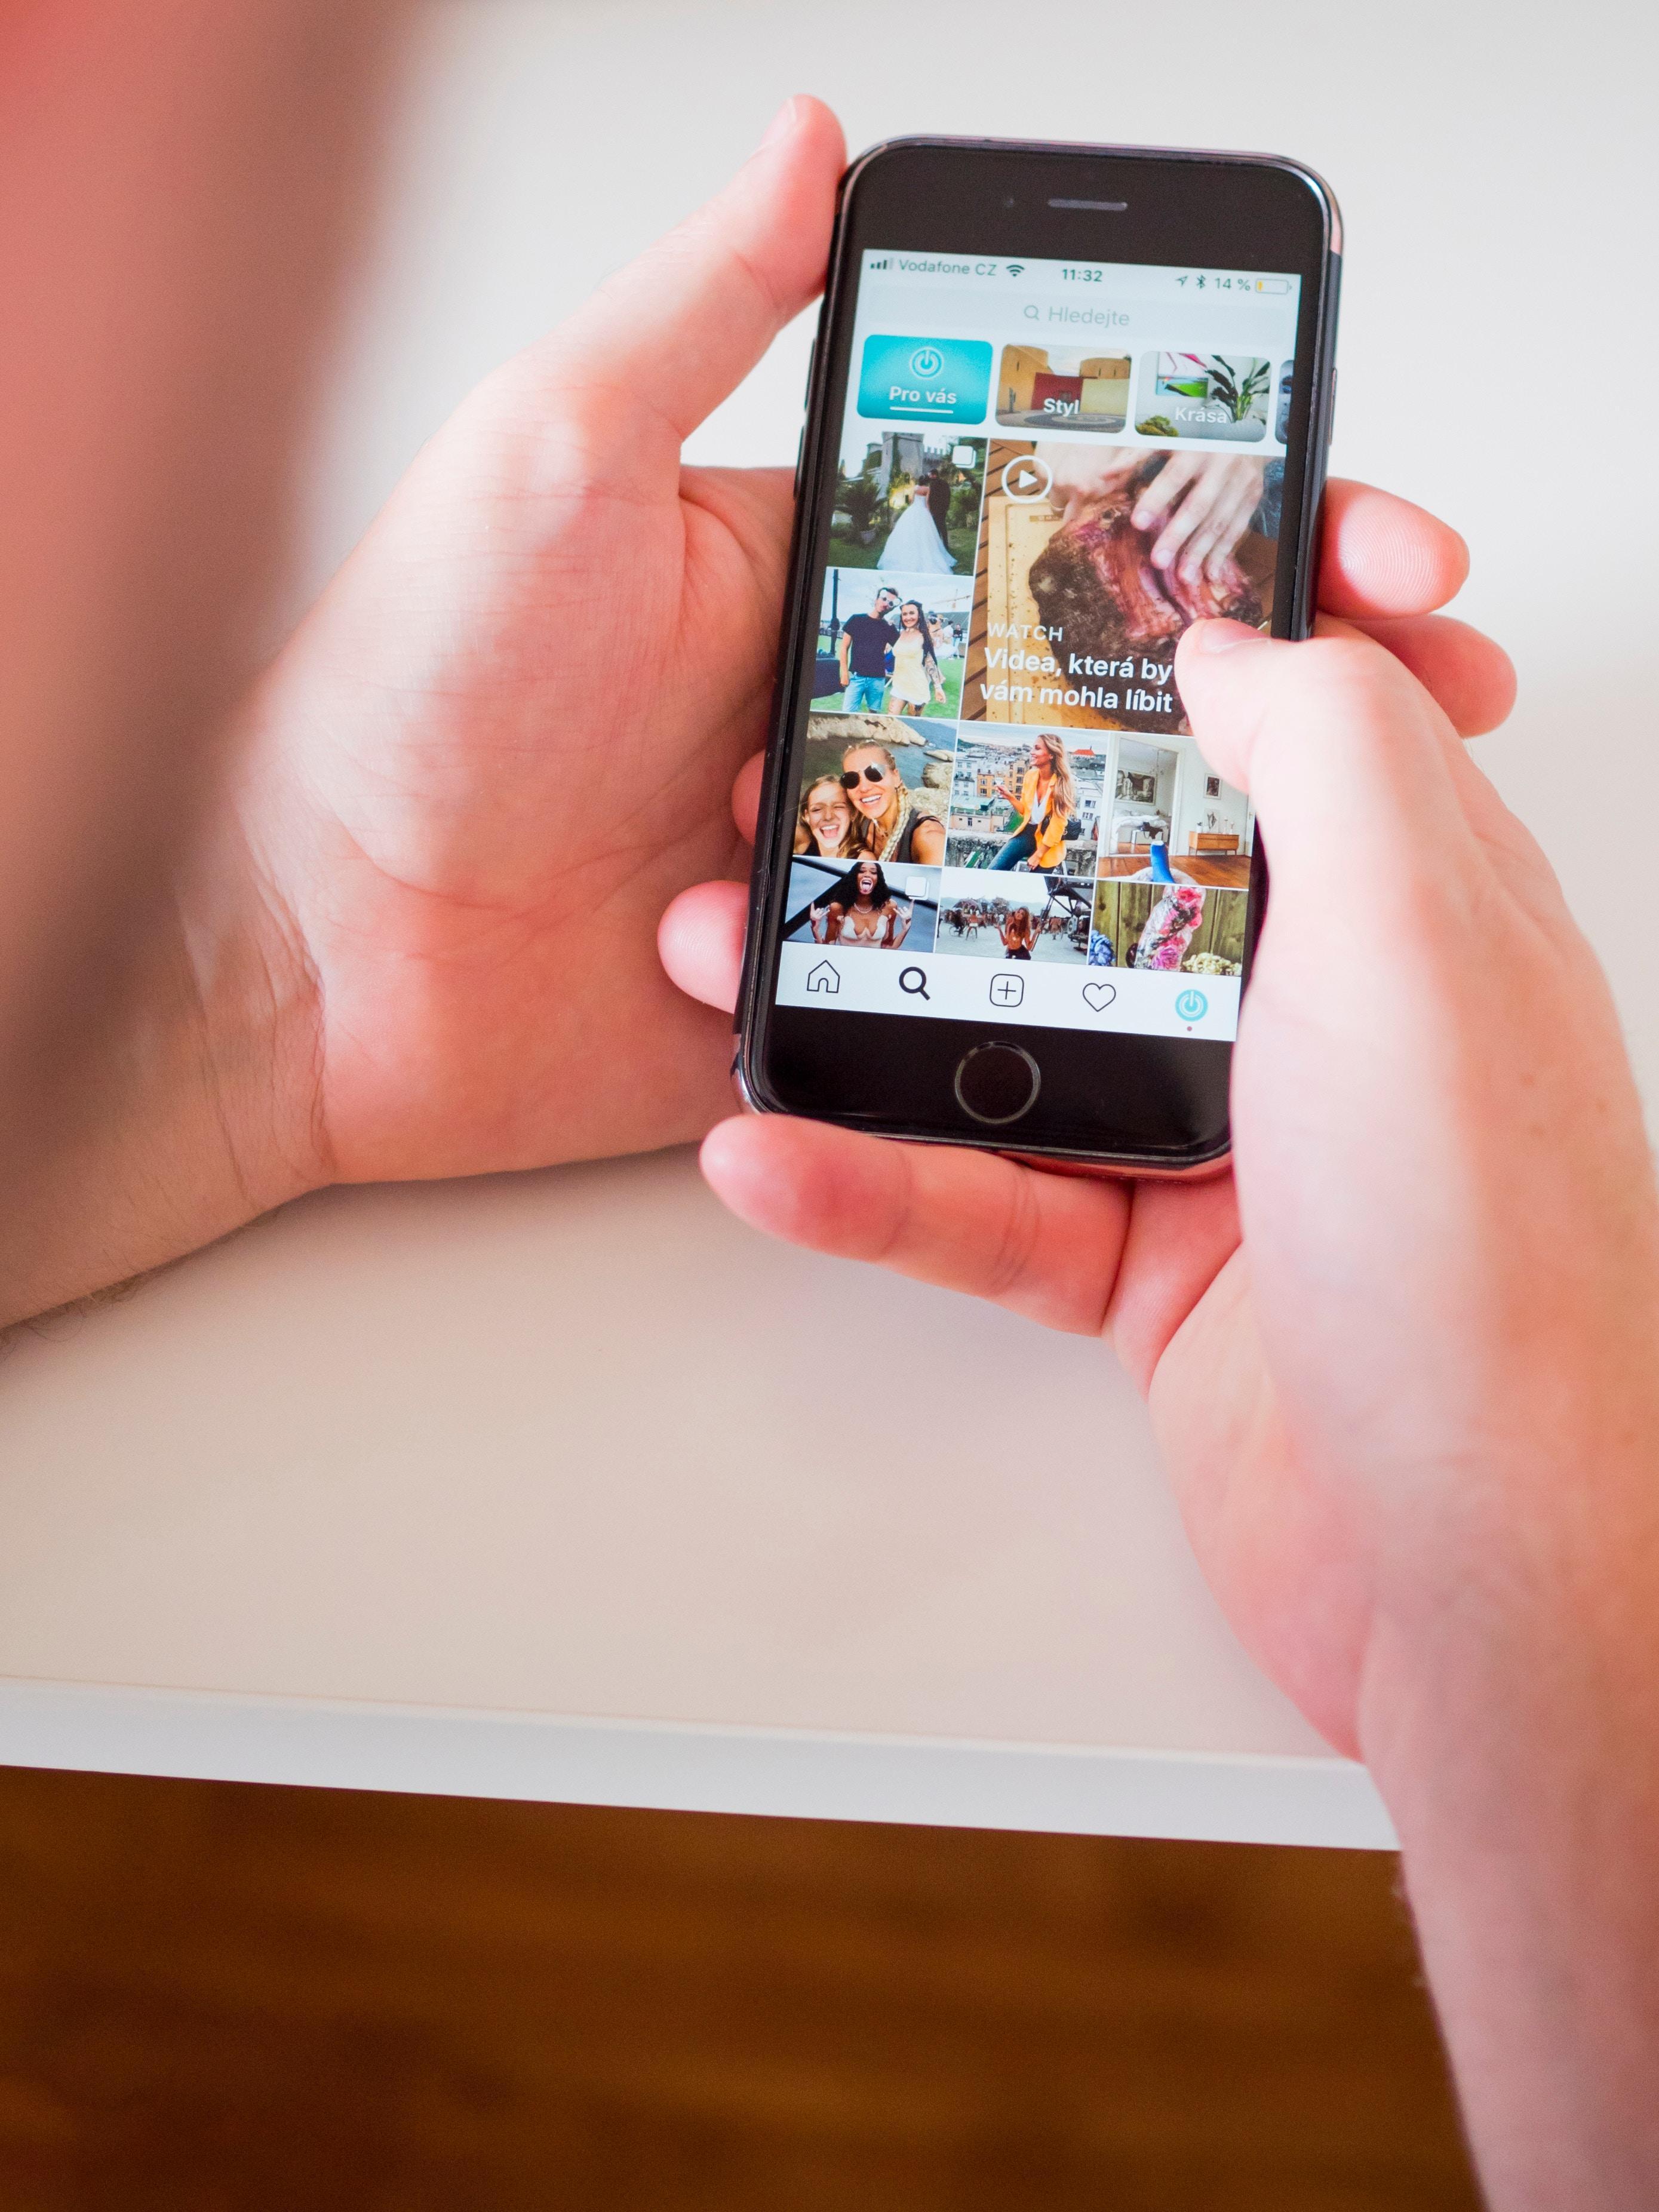 e343131332b 'Steeds vaker nepspullen verkocht via Instagram' | Binnenland | Telegraaf.nl